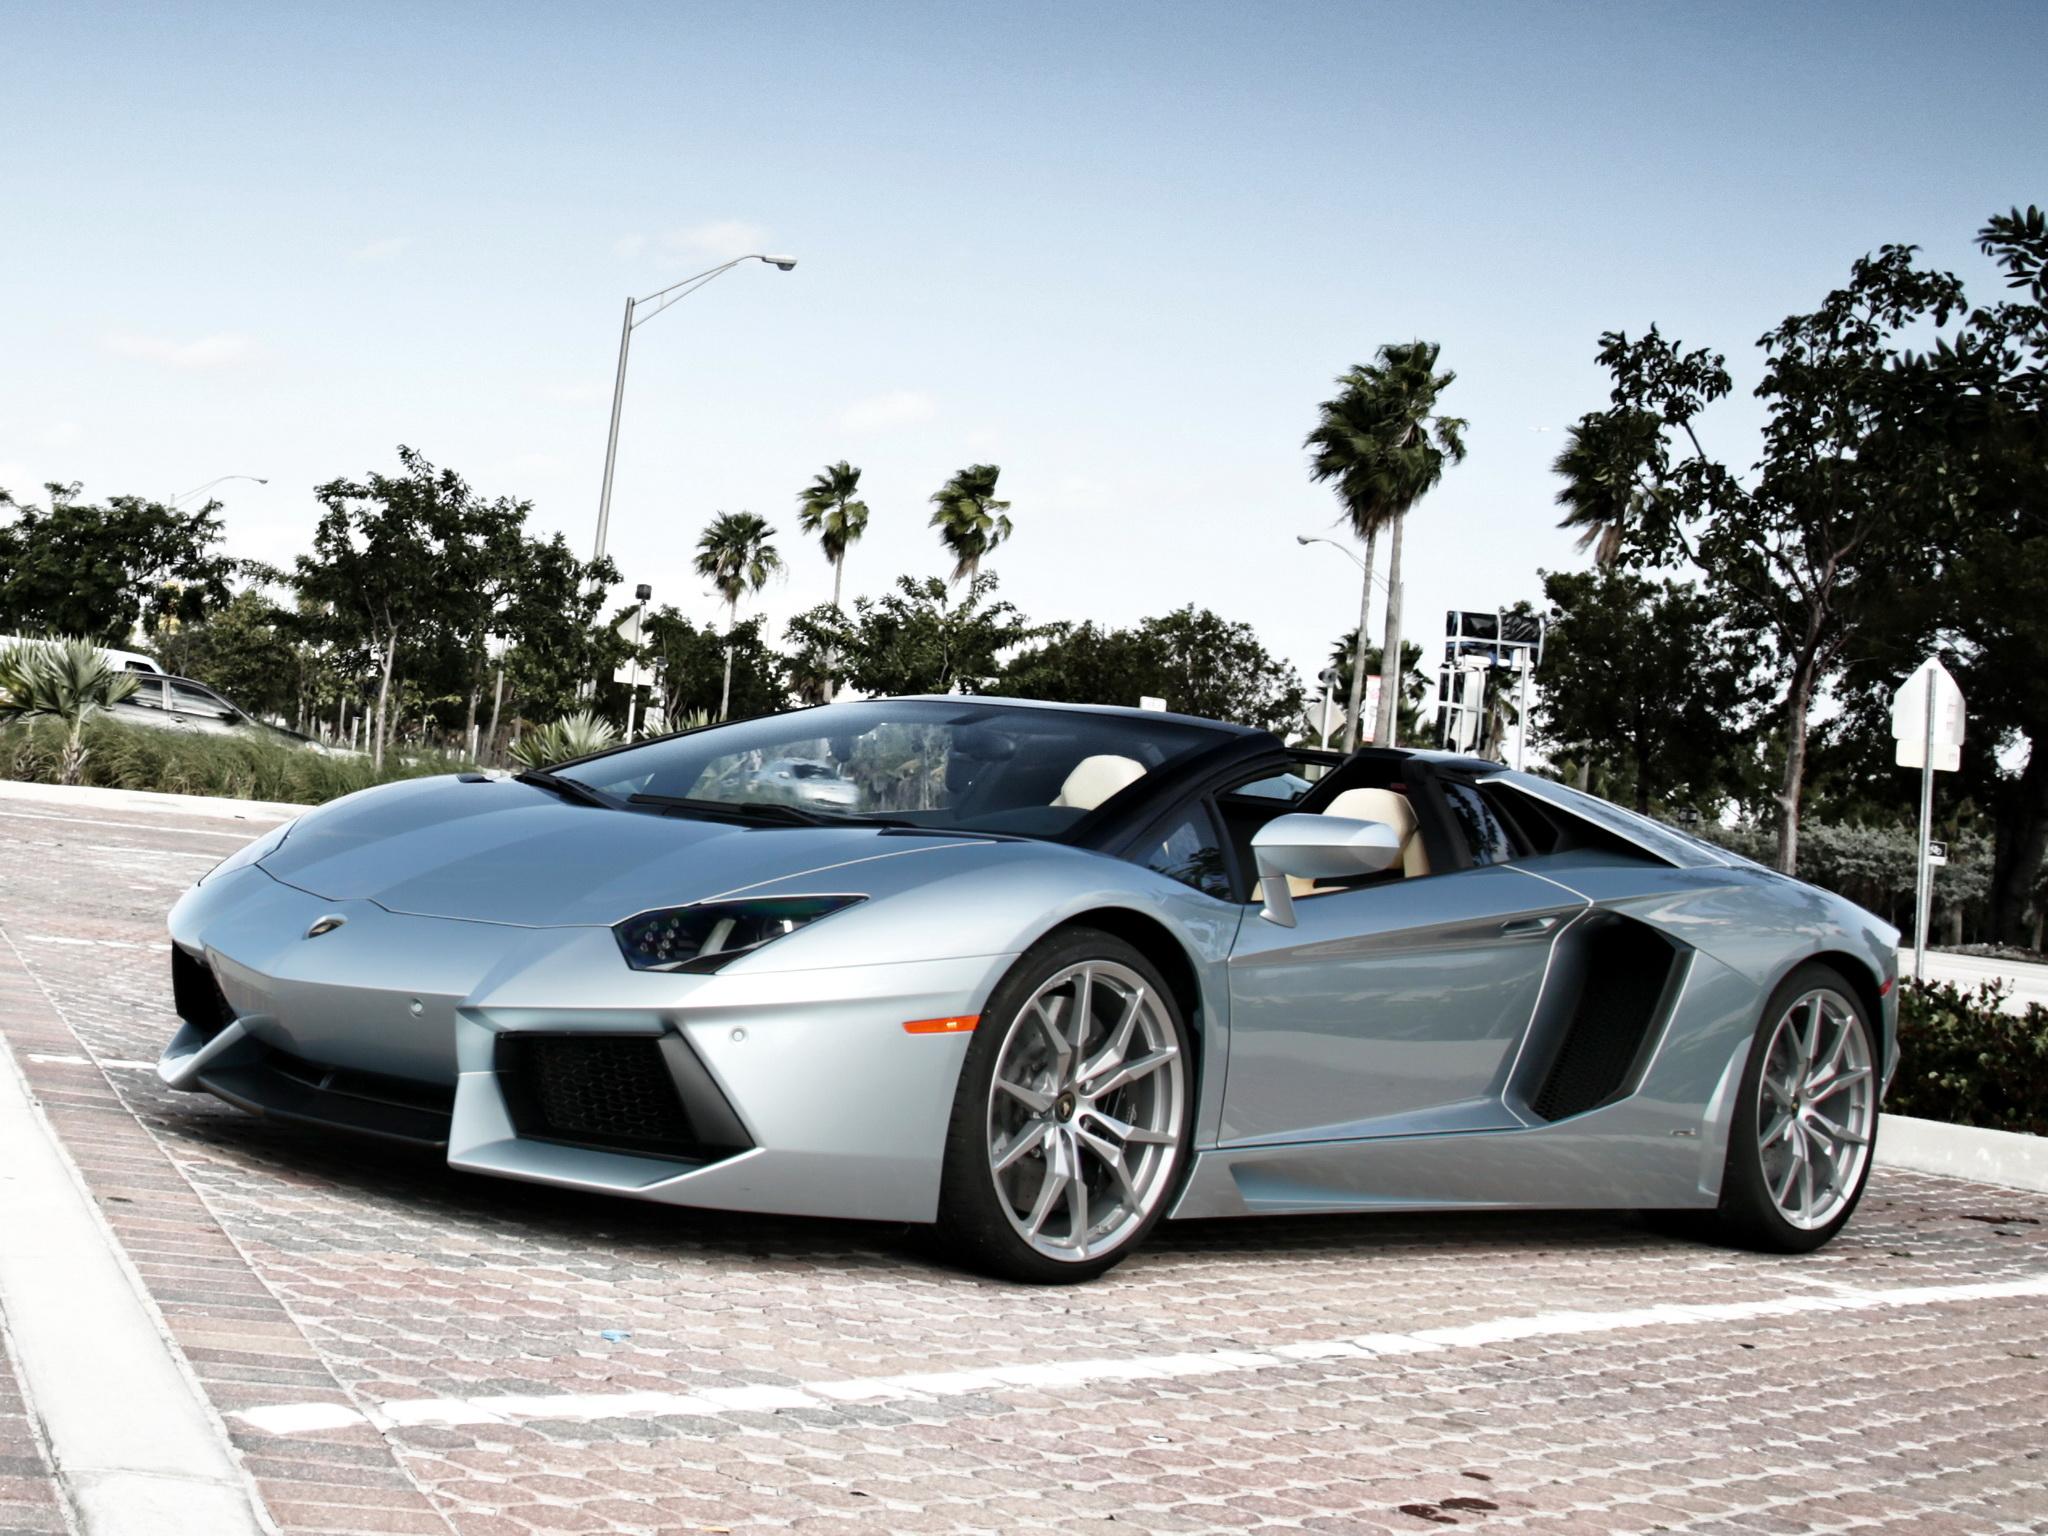 Lamborghini Aventador Roadster supercar silver t wallpaper 2048x1536 2048x1536